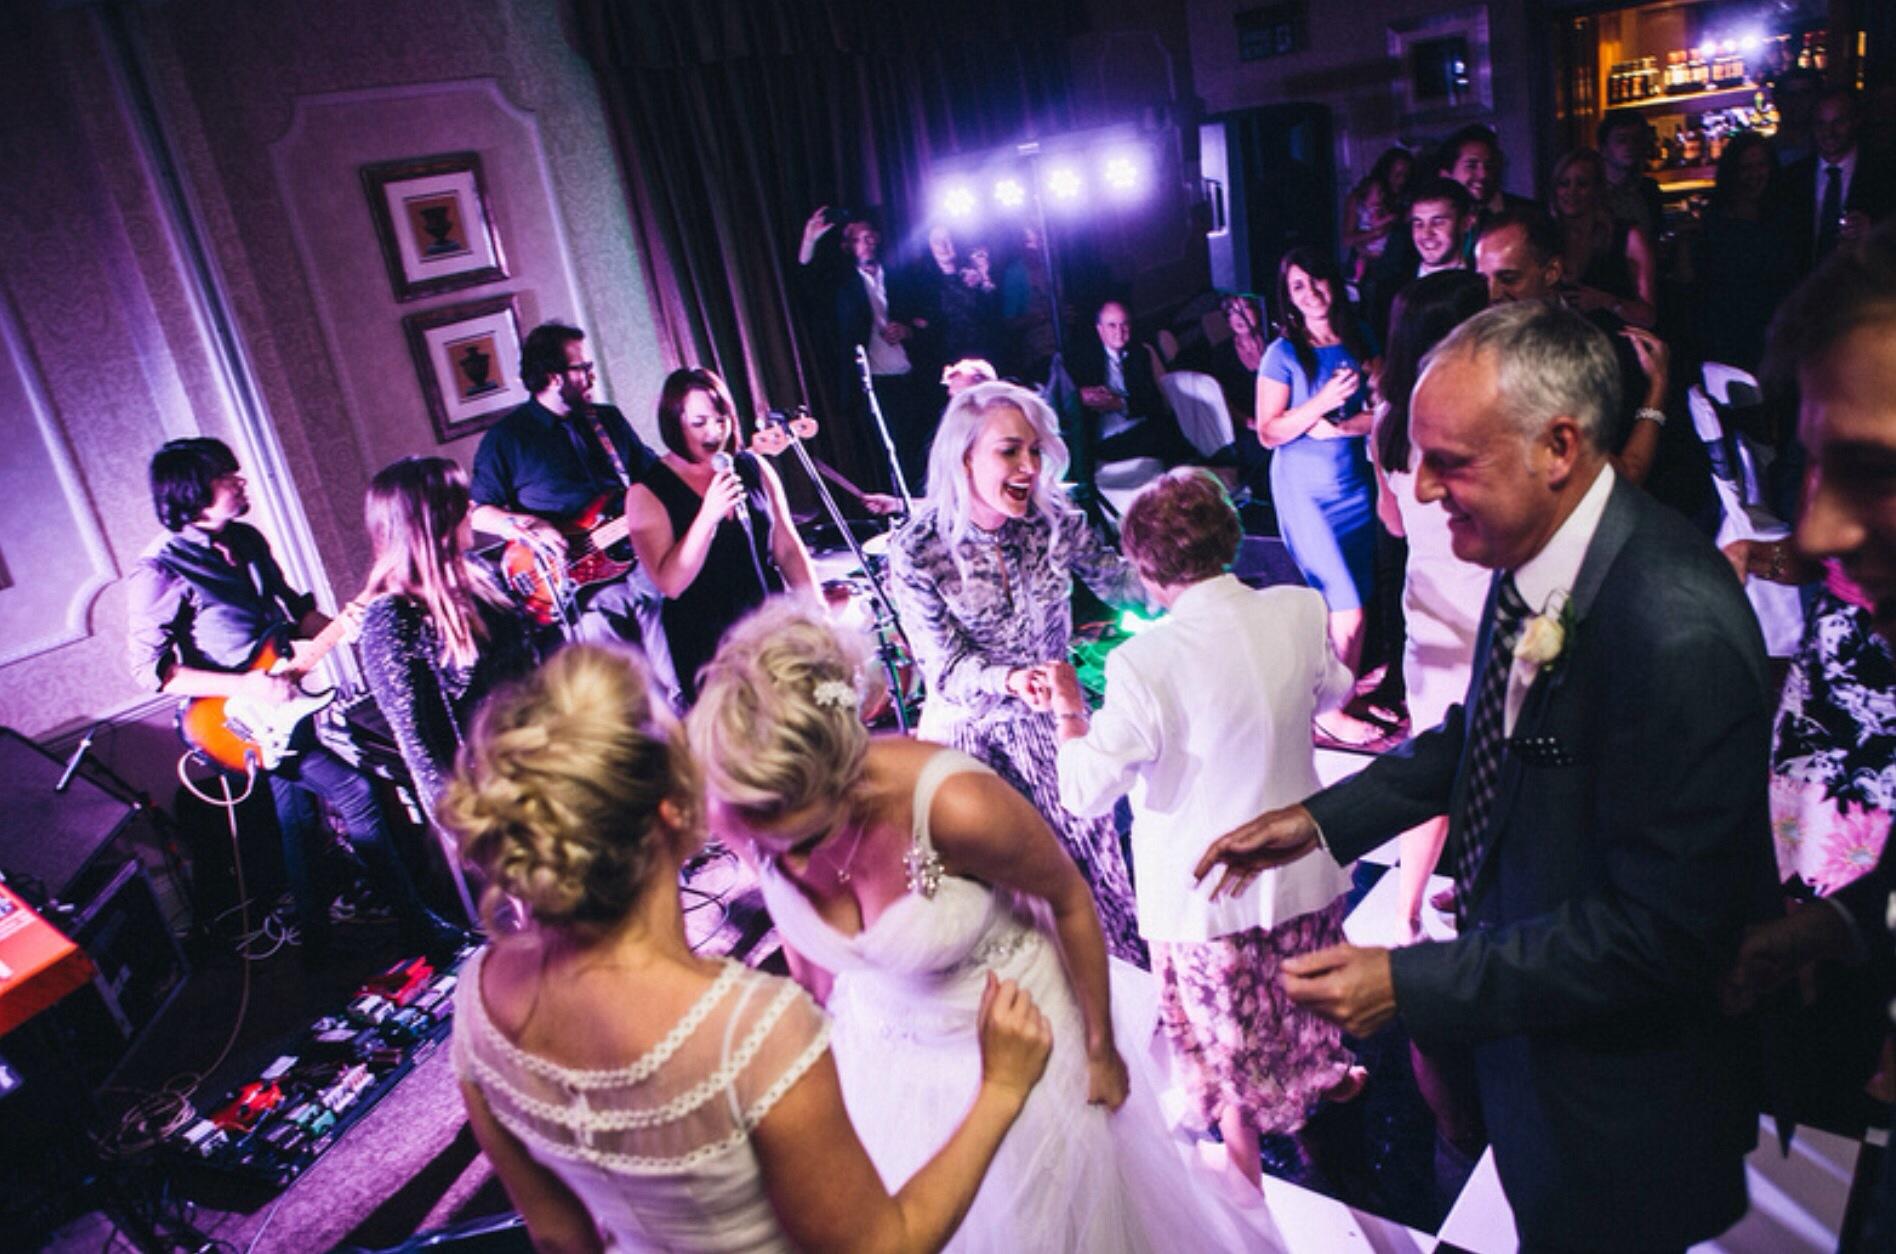 ... wedding jewish wedding bar mitzvah manchester lancashire wedding band